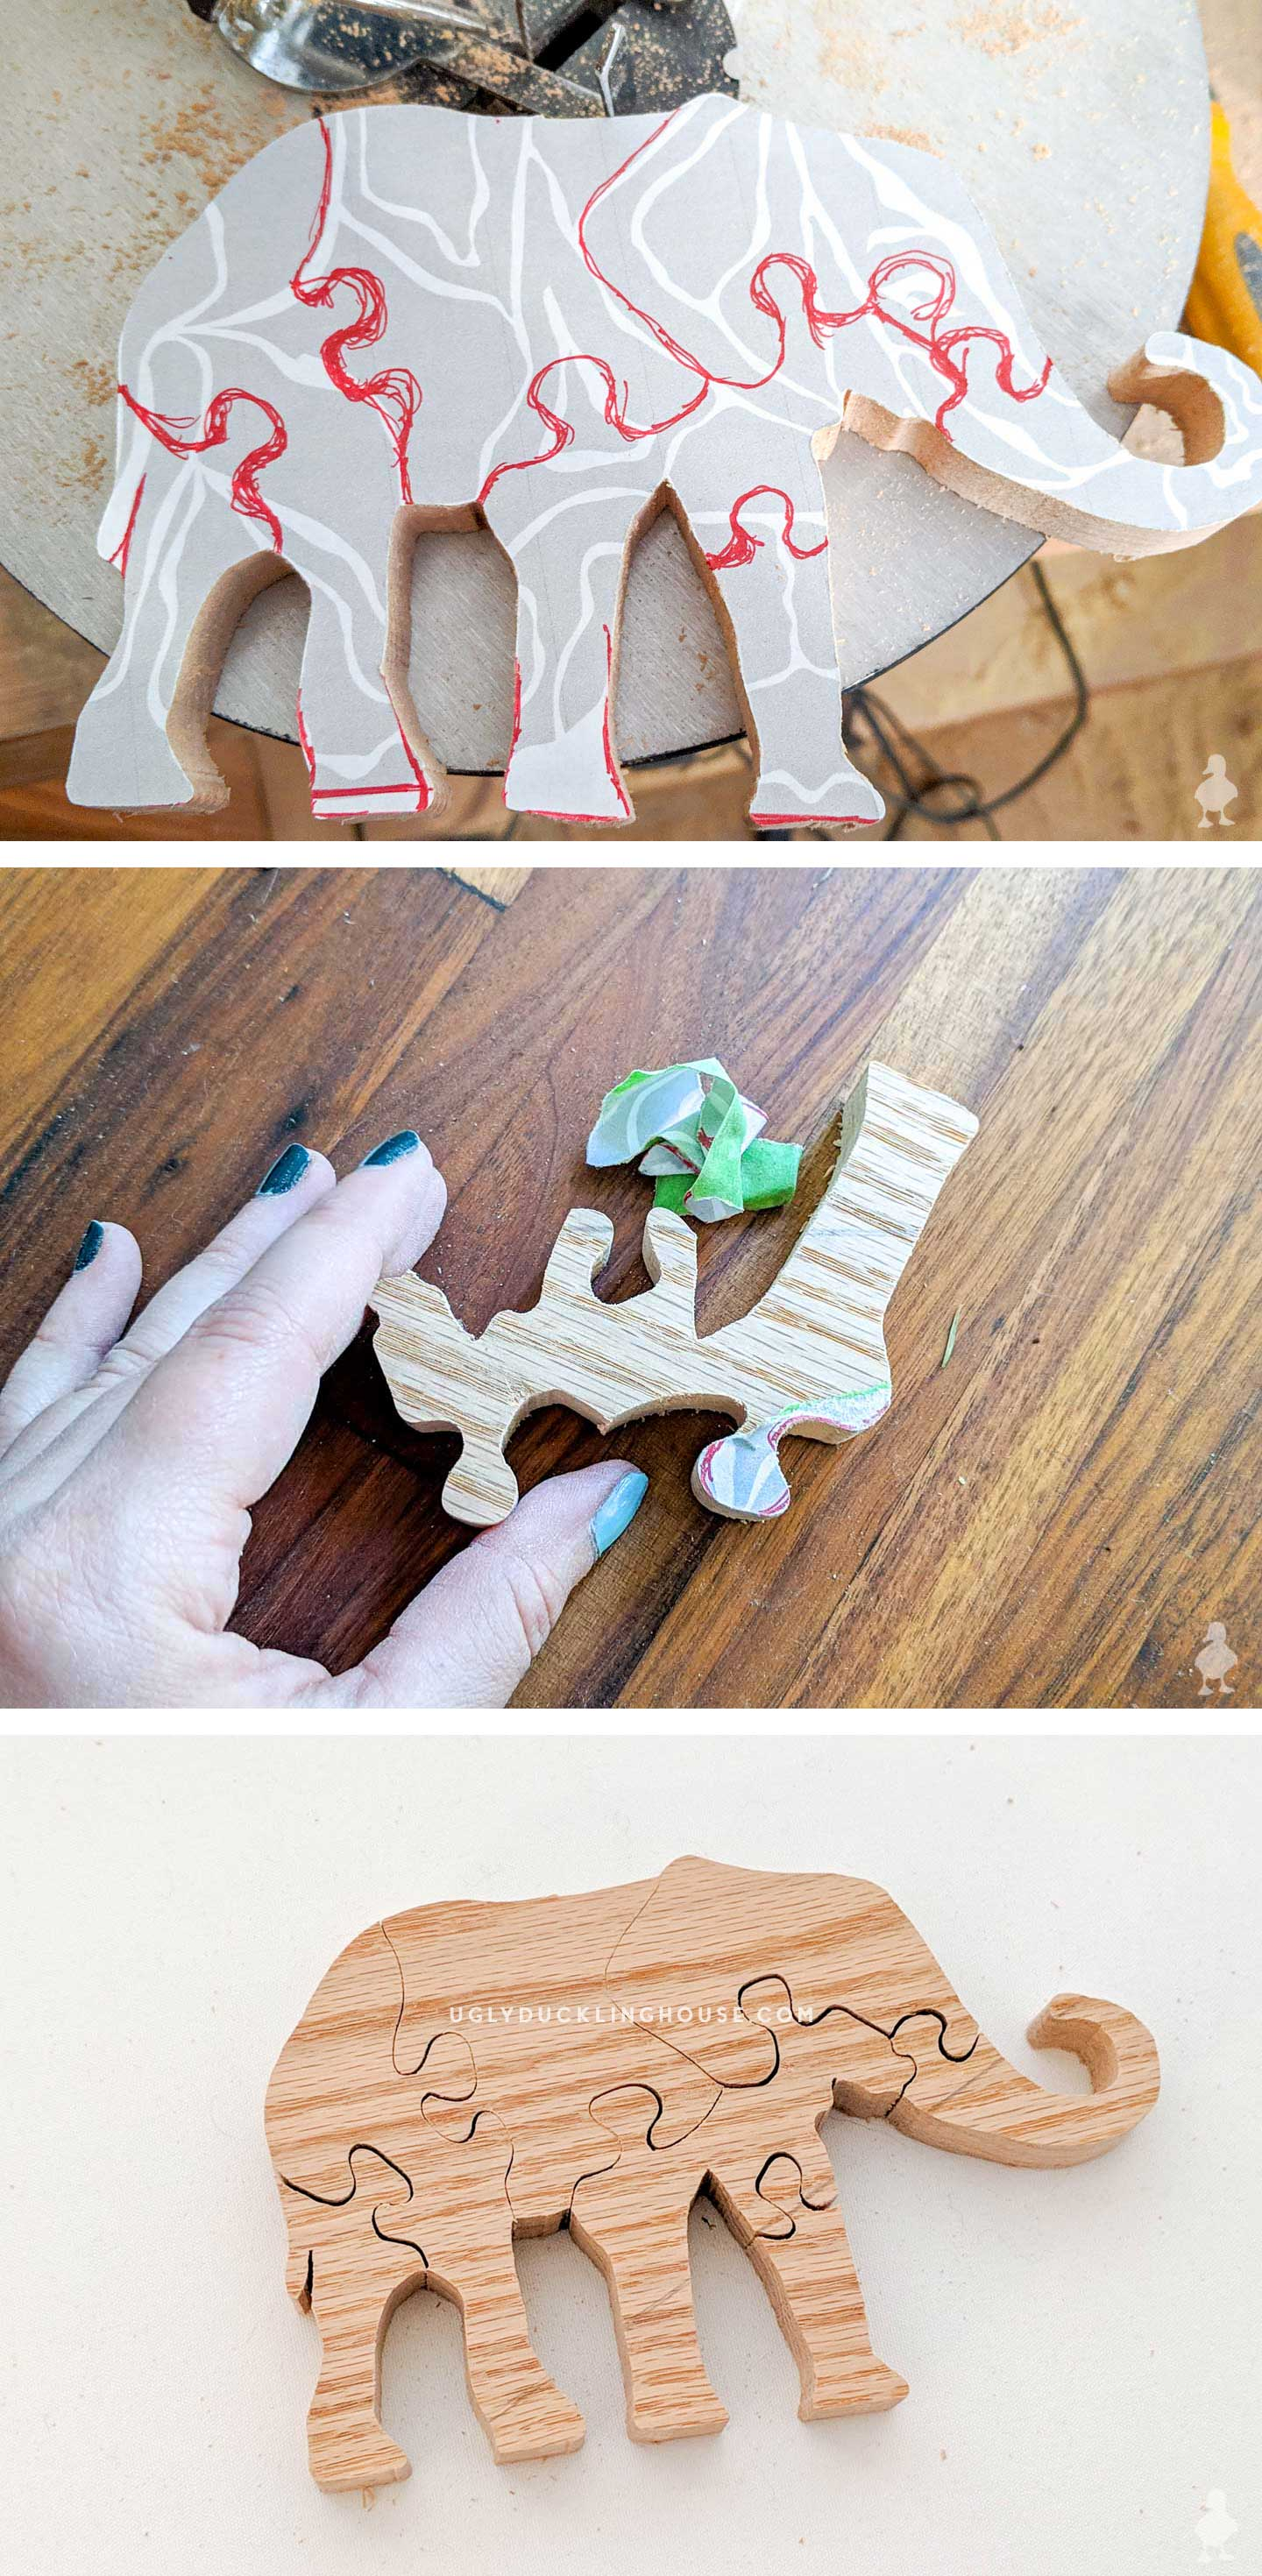 diy elephant wood puzzle from scrap oak